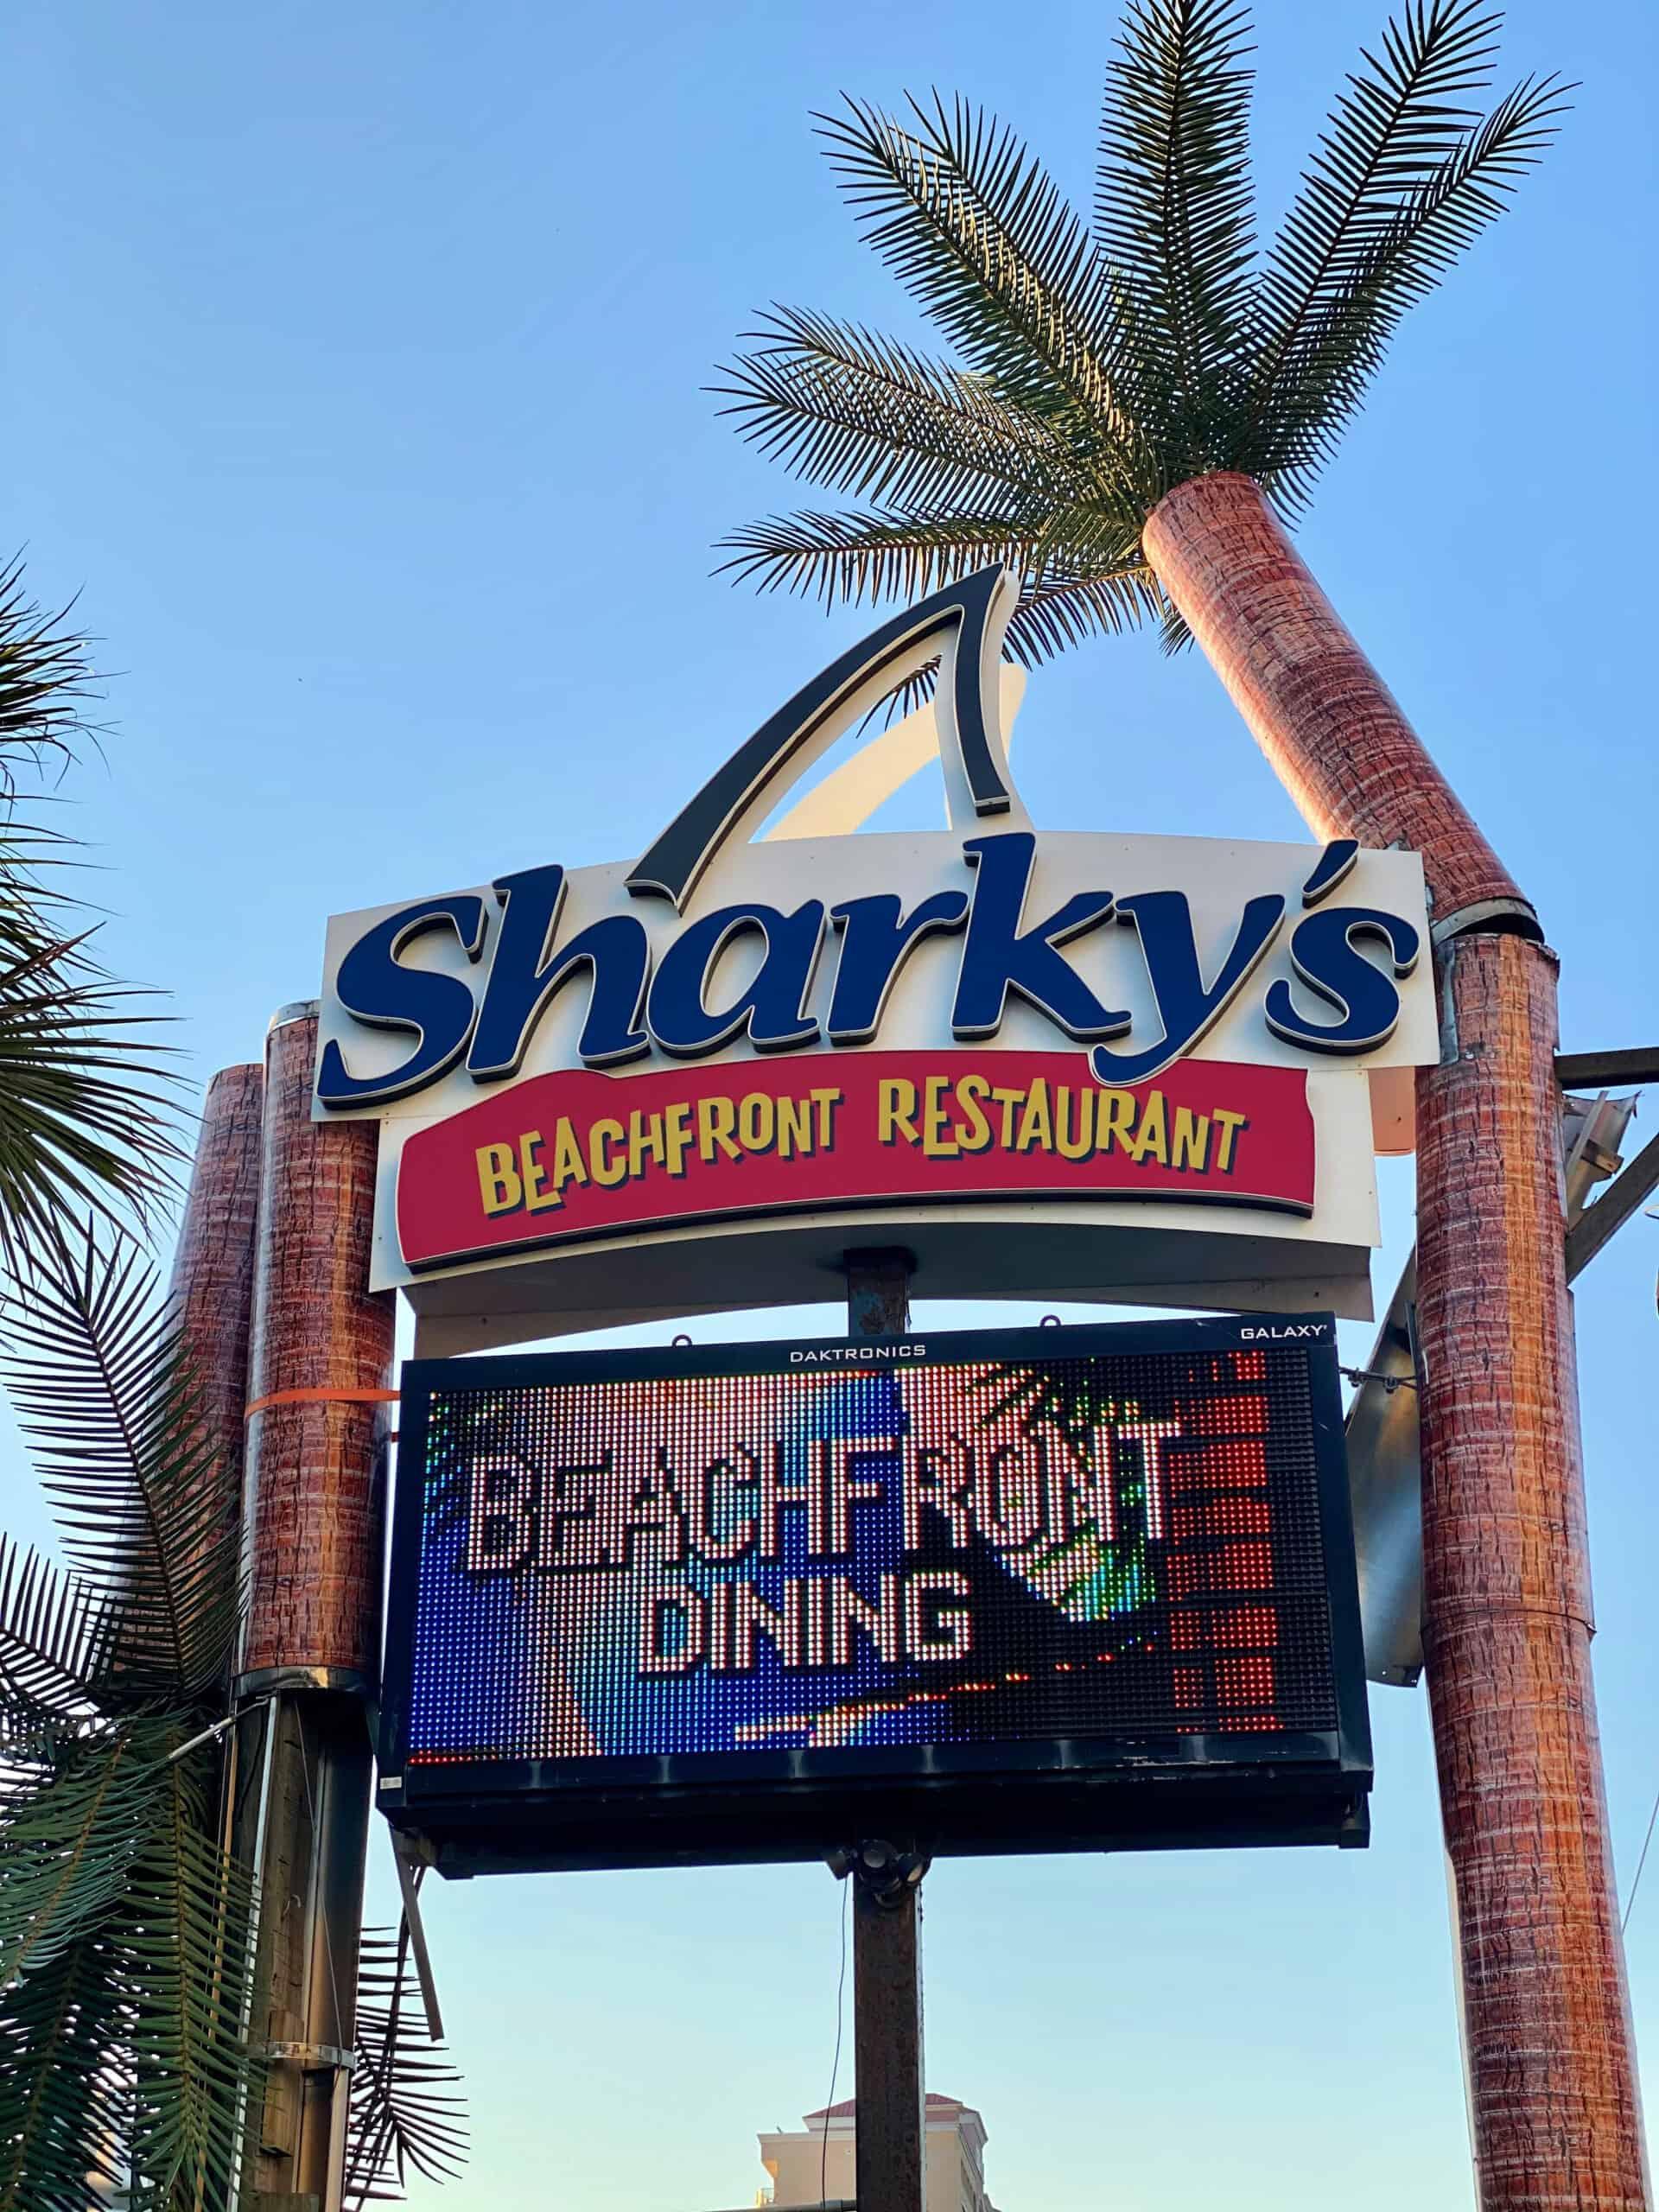 Sharky's Beachfront Restaurant sign